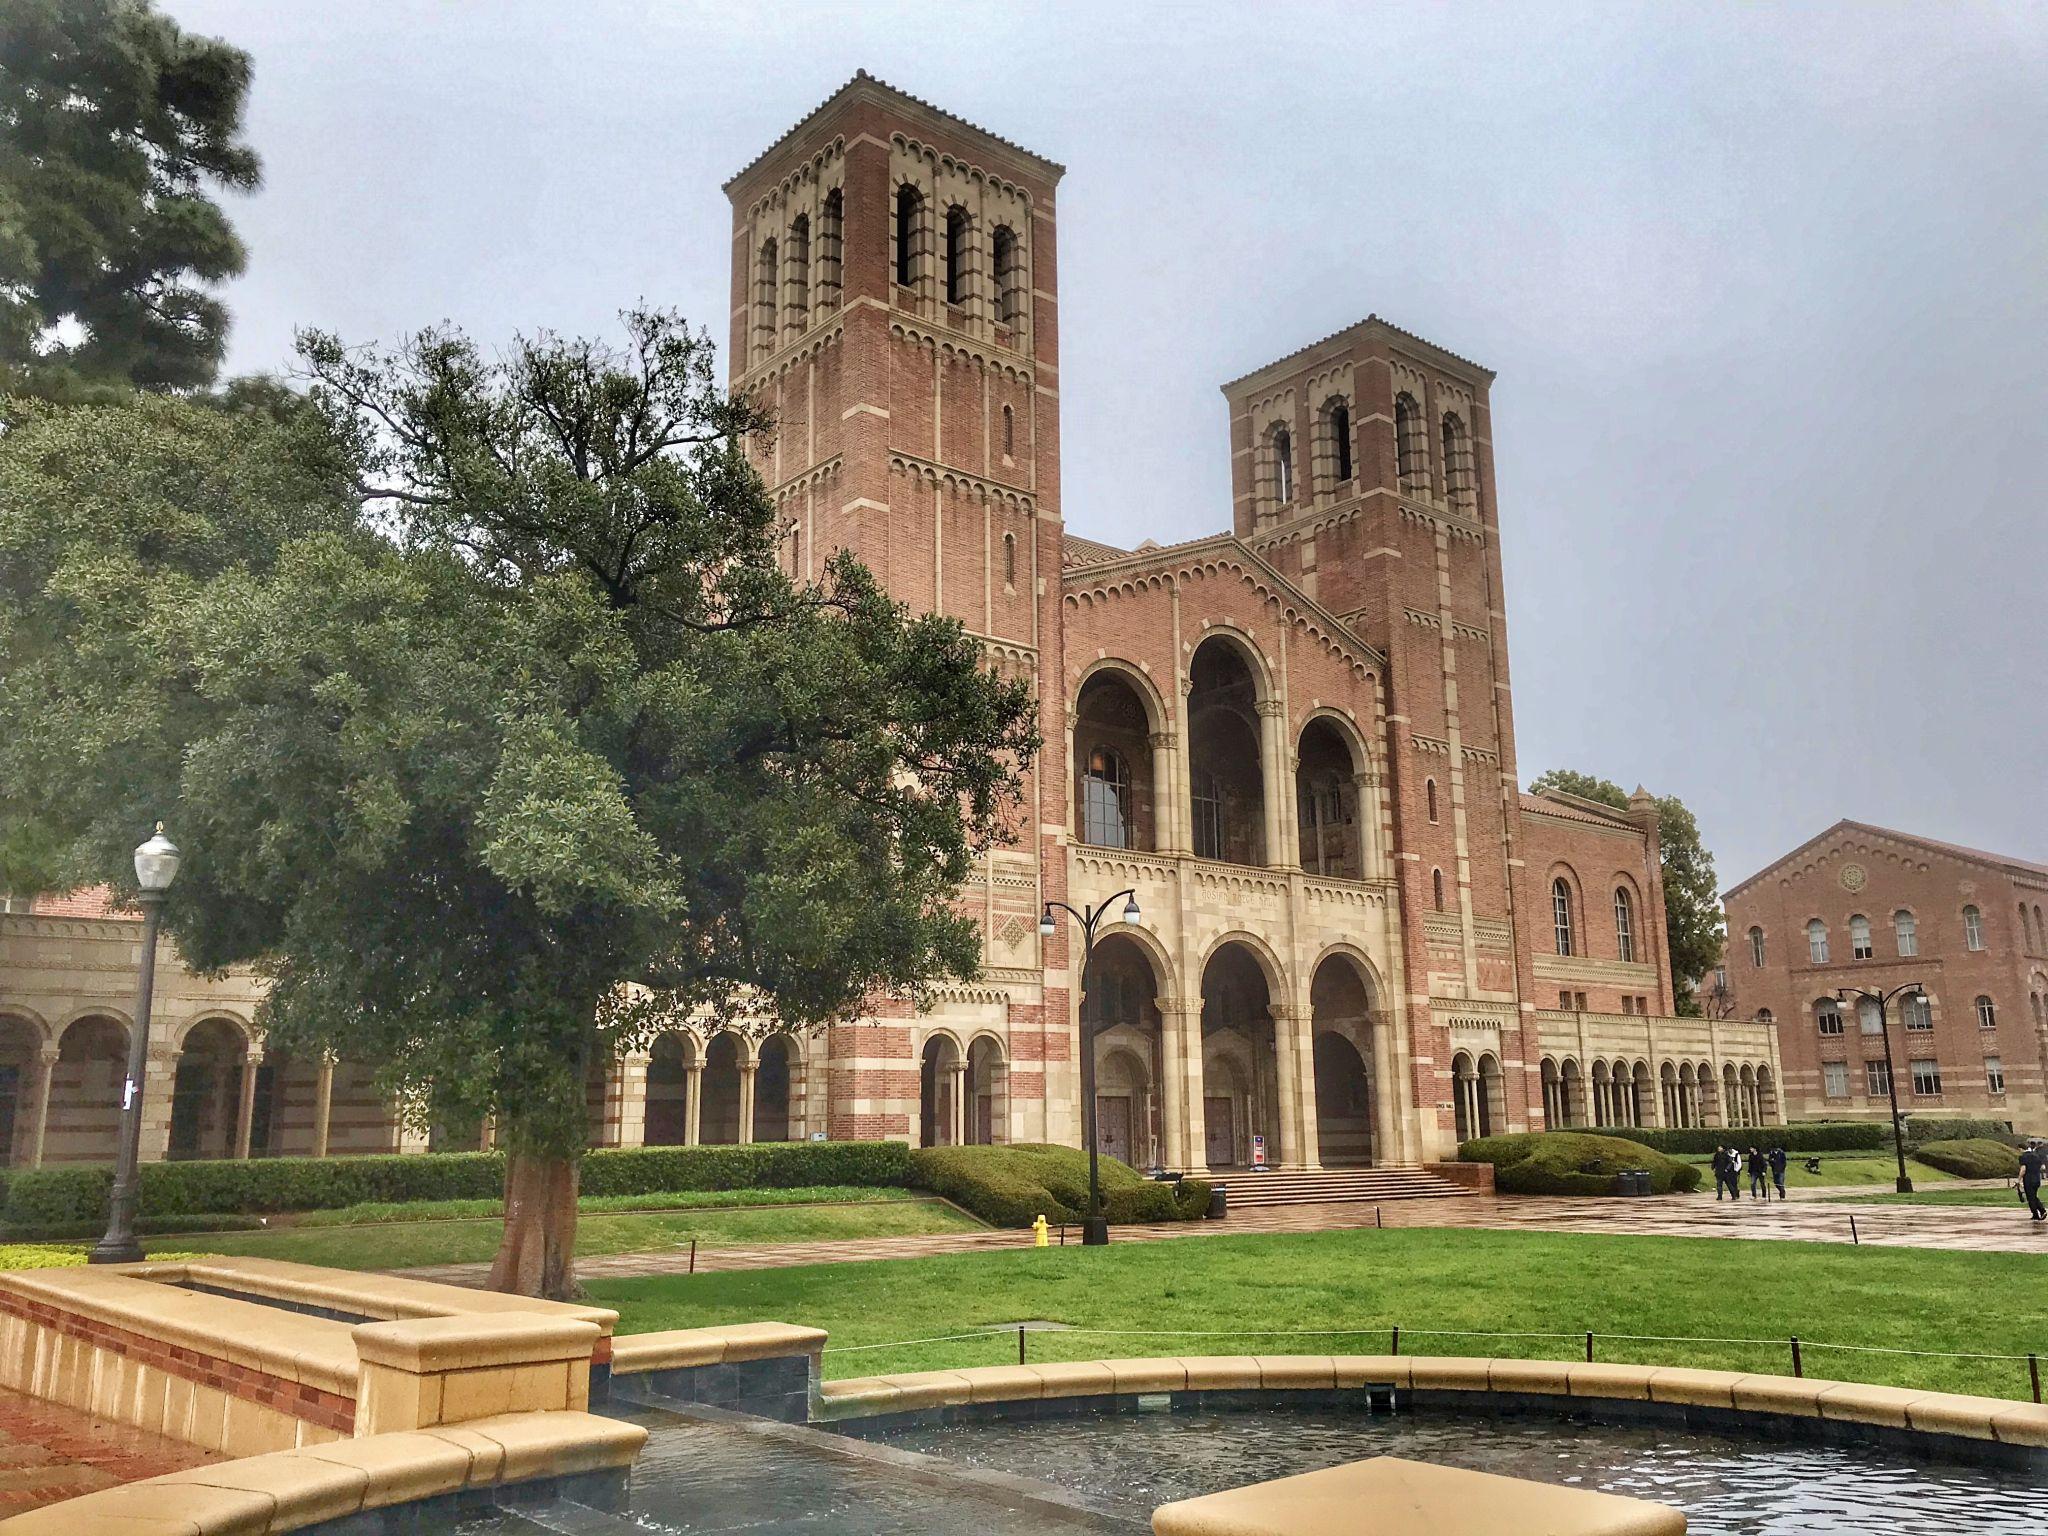 University of California, Los Angeles (UCLA), USA